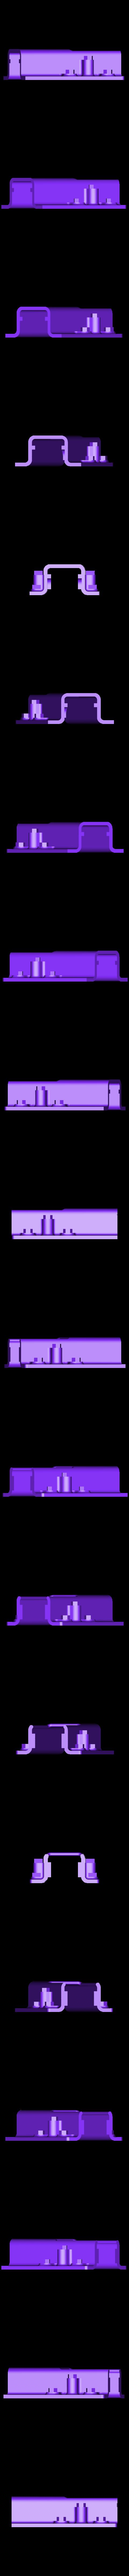 Crosshead_Guild_Lower_Support.STL Download free STL file 4-8-8-4 Big Boy Locomotive • 3D printer object, RaymondDeLuca